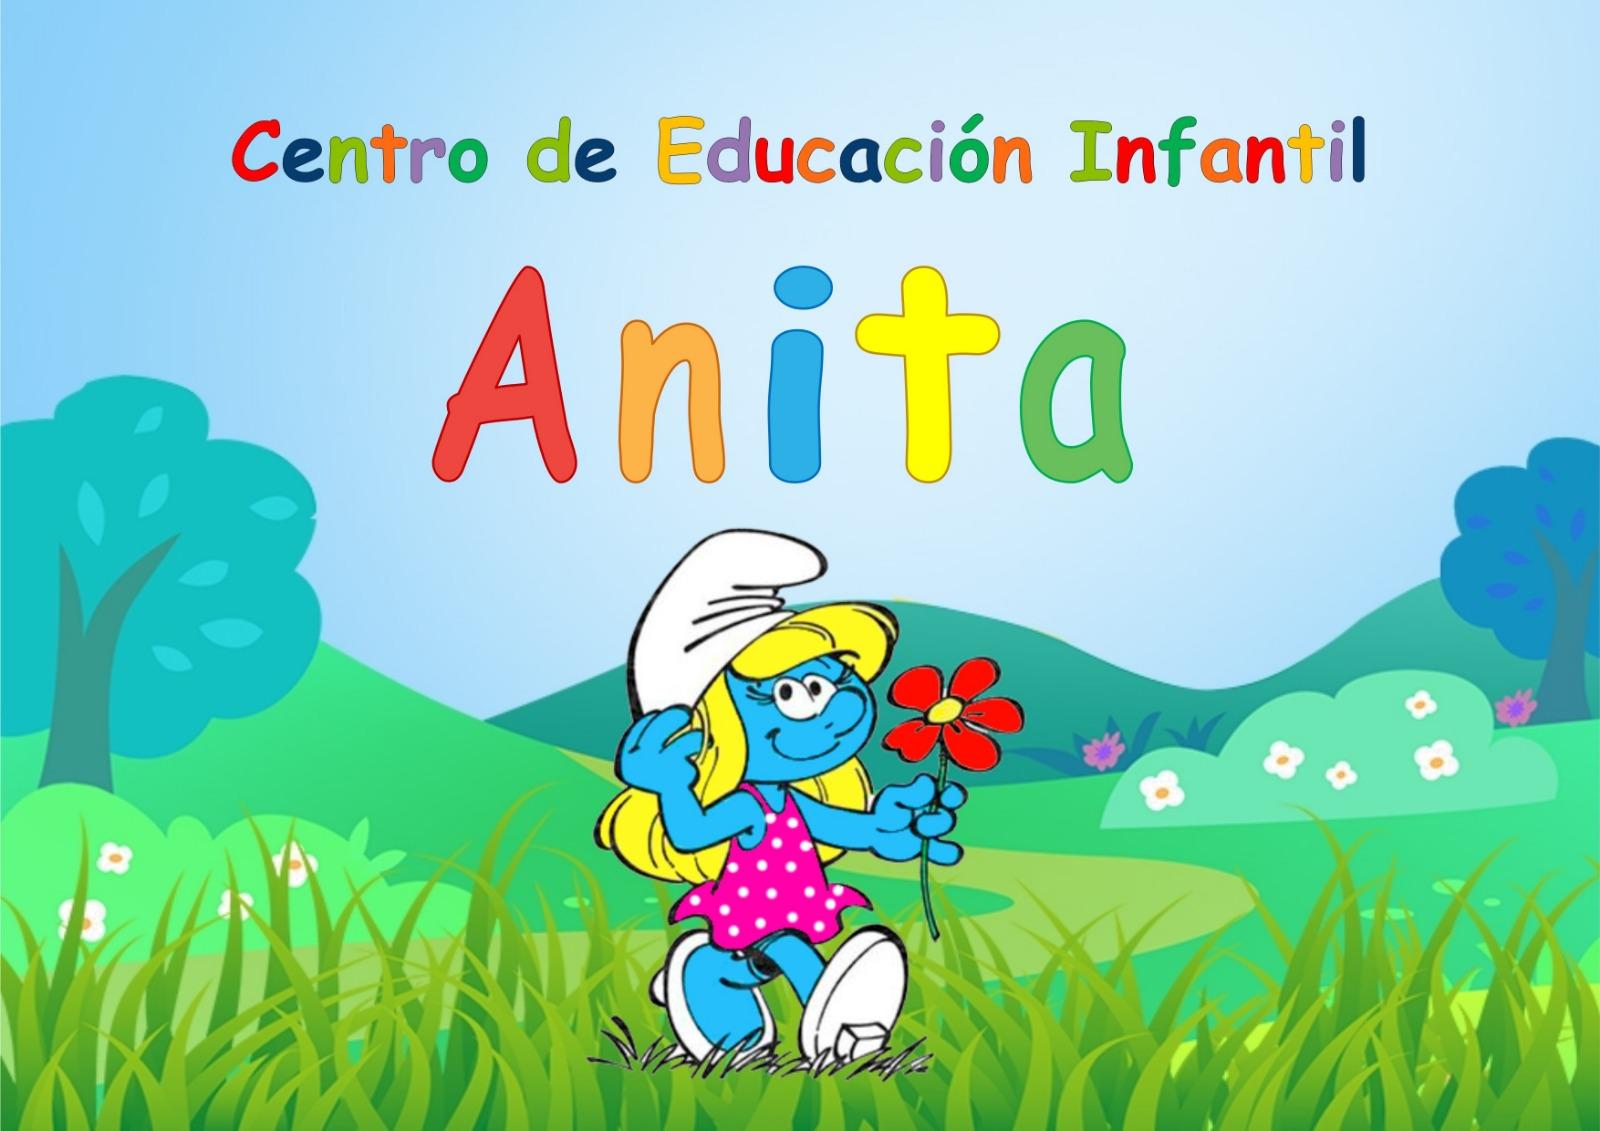 Centro De Educación Infantil Anita